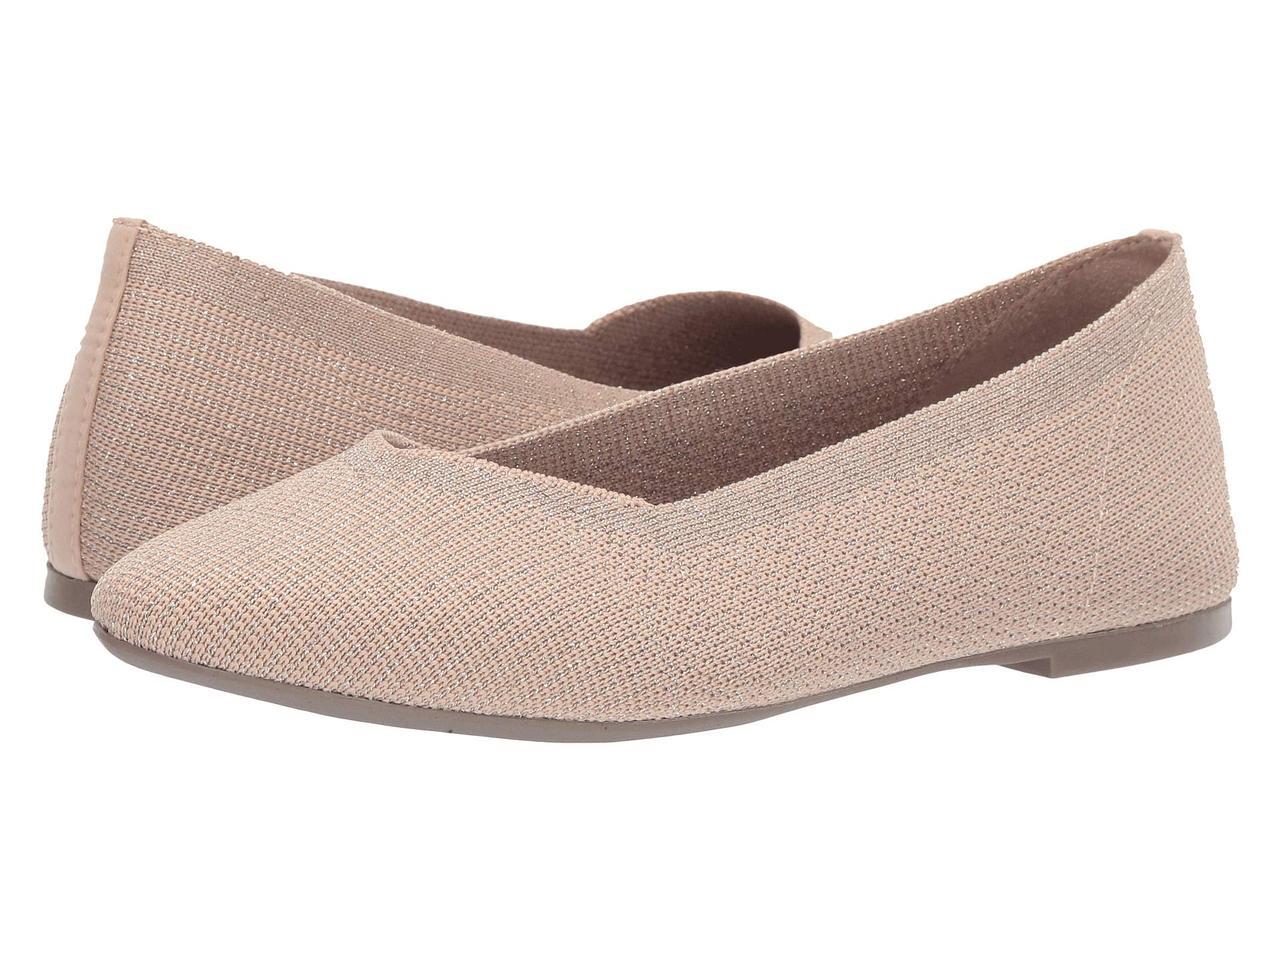 Туфли без каблука (Оригинал) SKECHERS Cleo - Skokie Natural